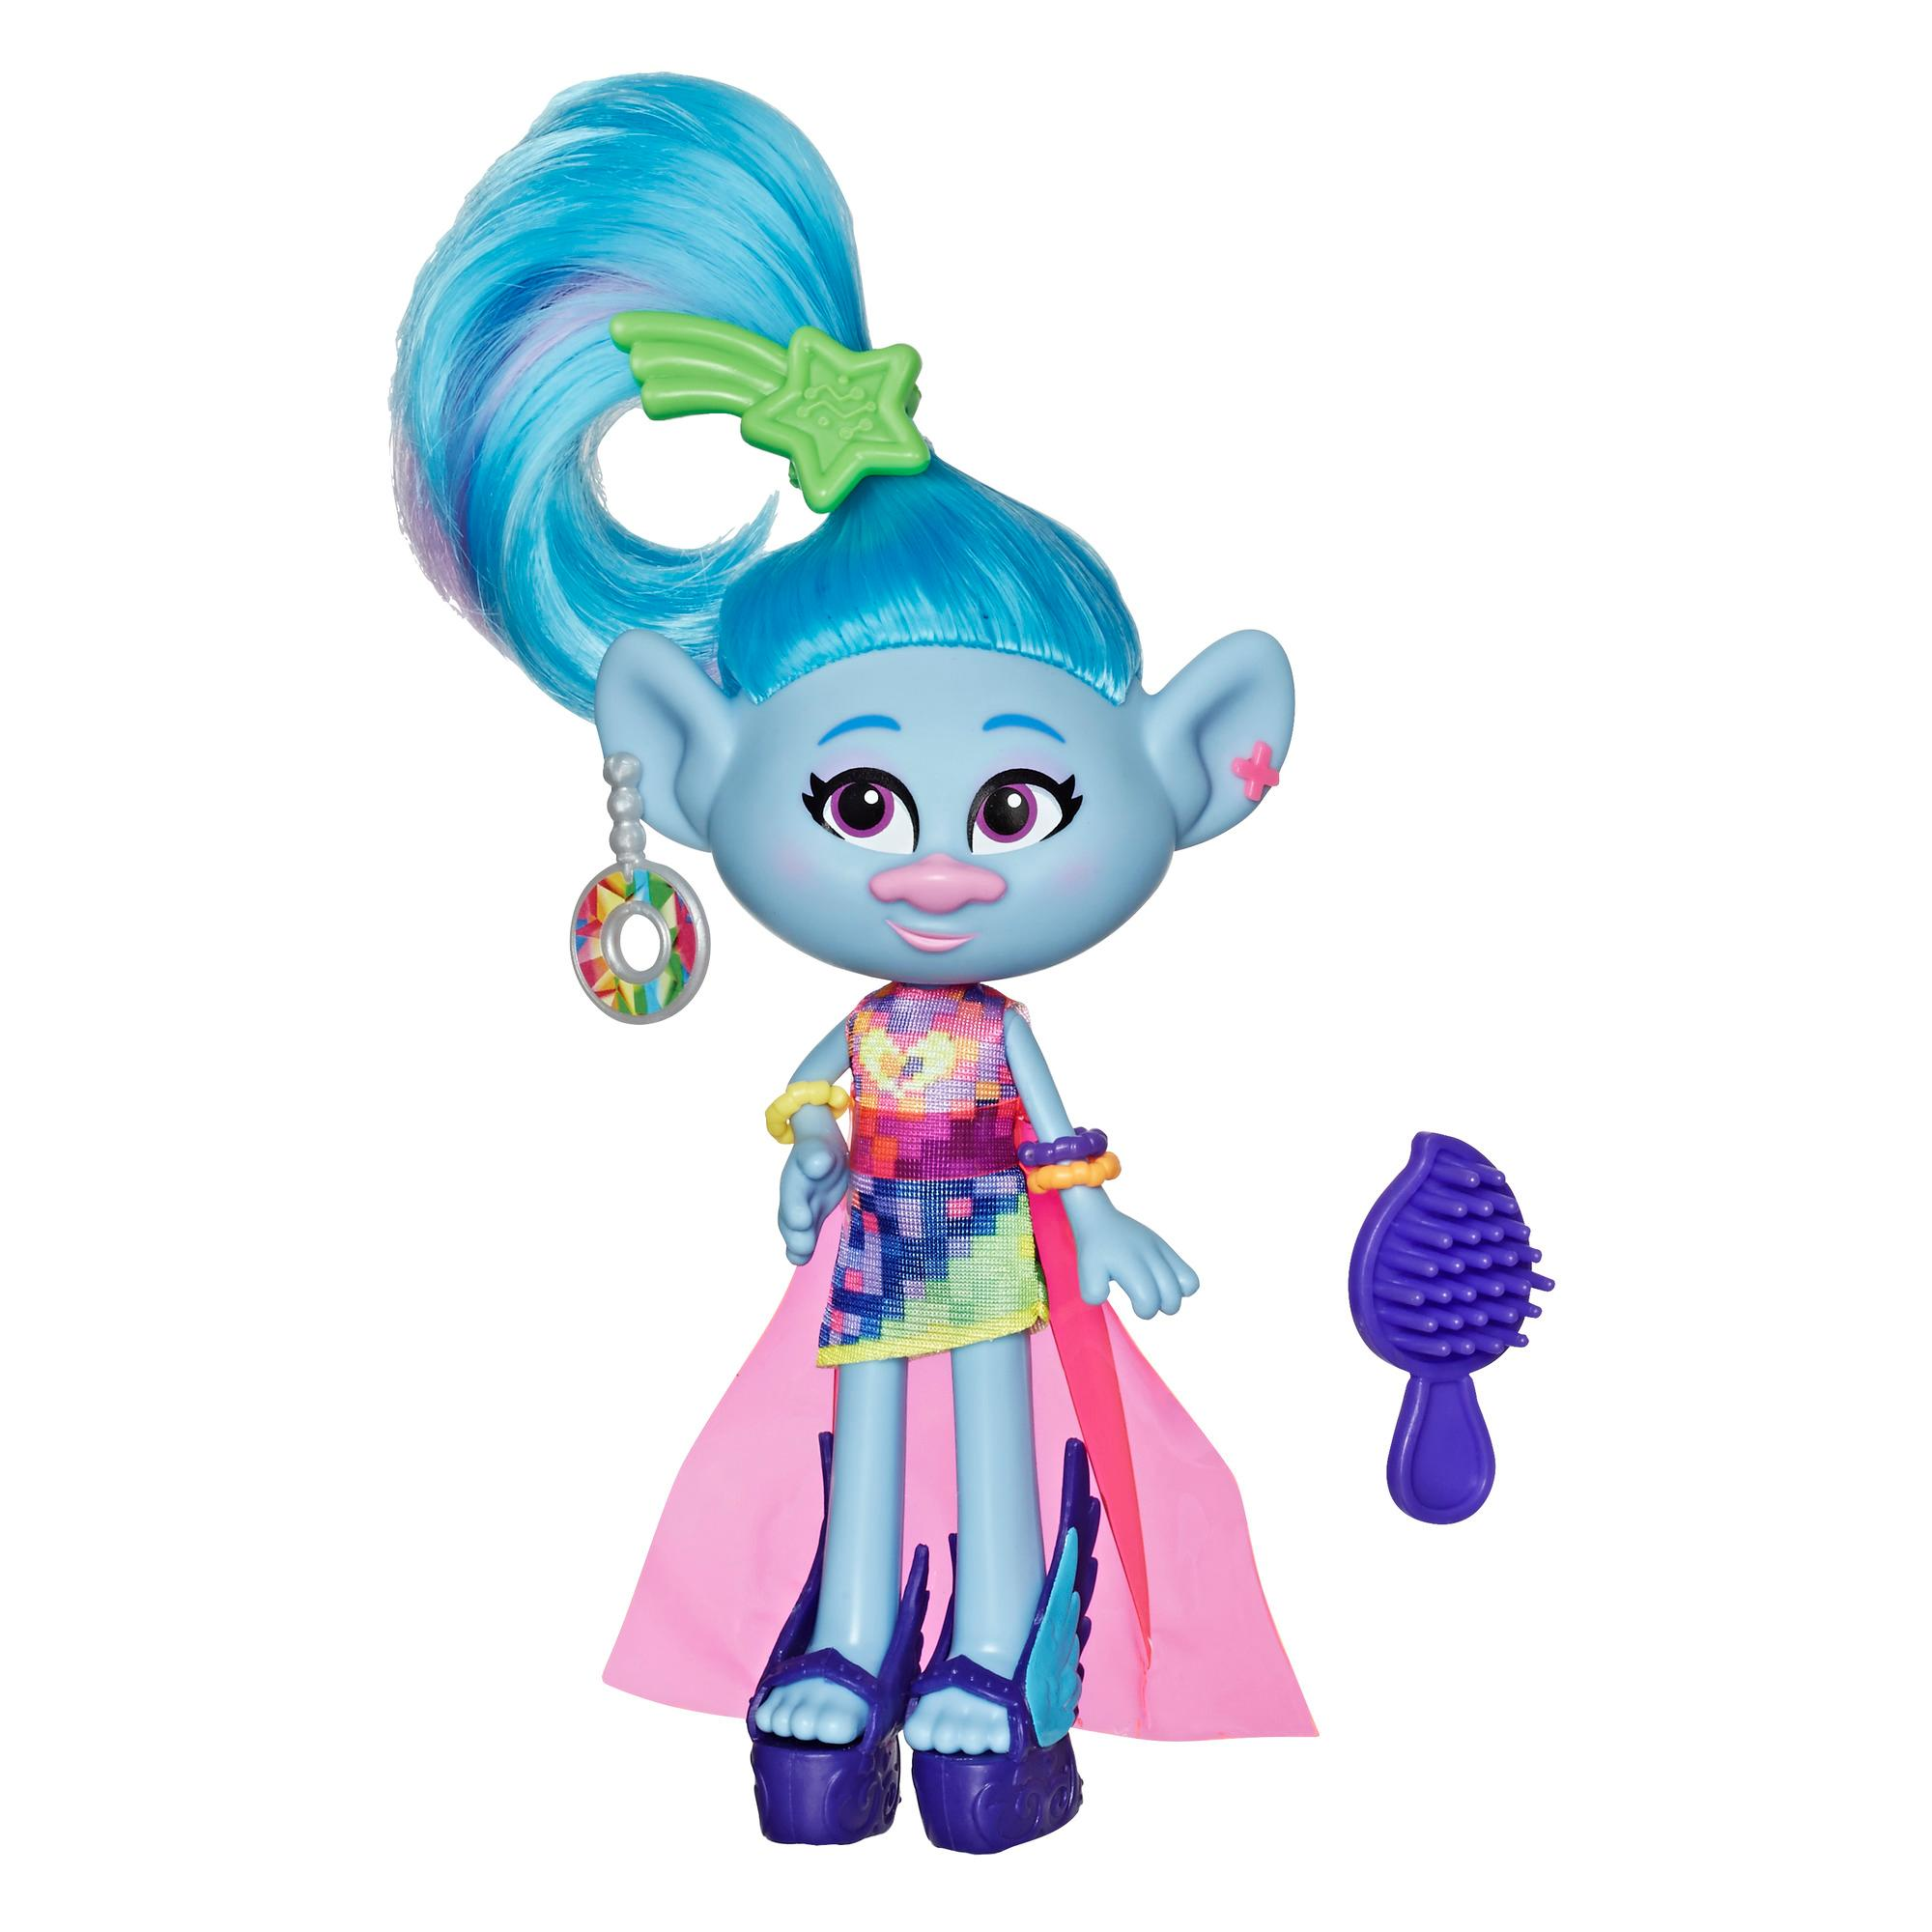 DreamWorks Trolls Glamour Seide Fashion Puppe